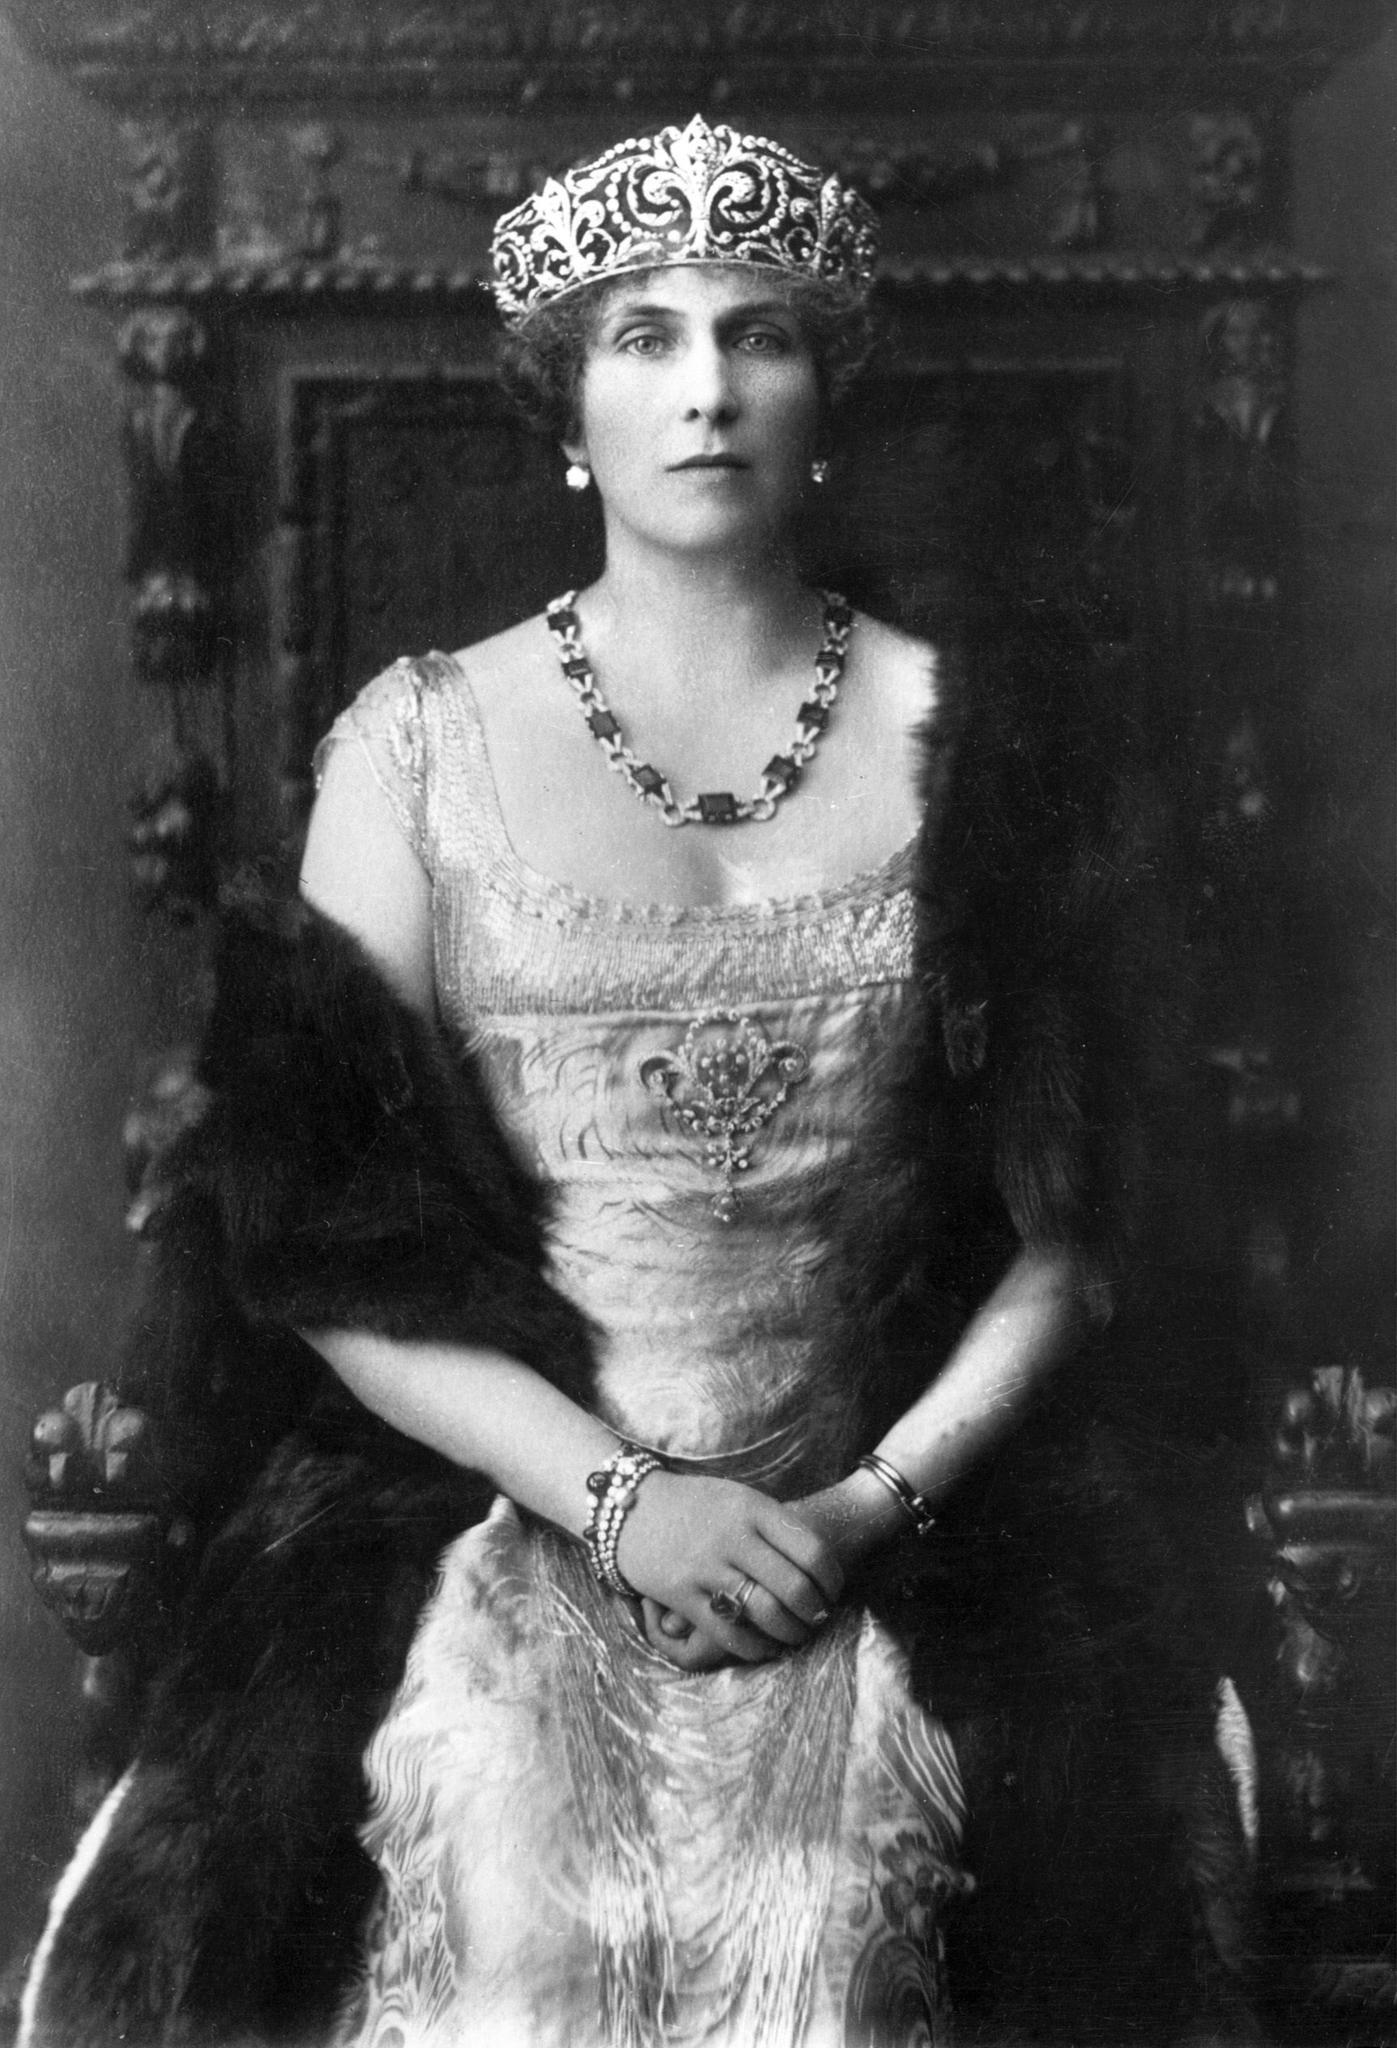 Königin Victoria Eugenia